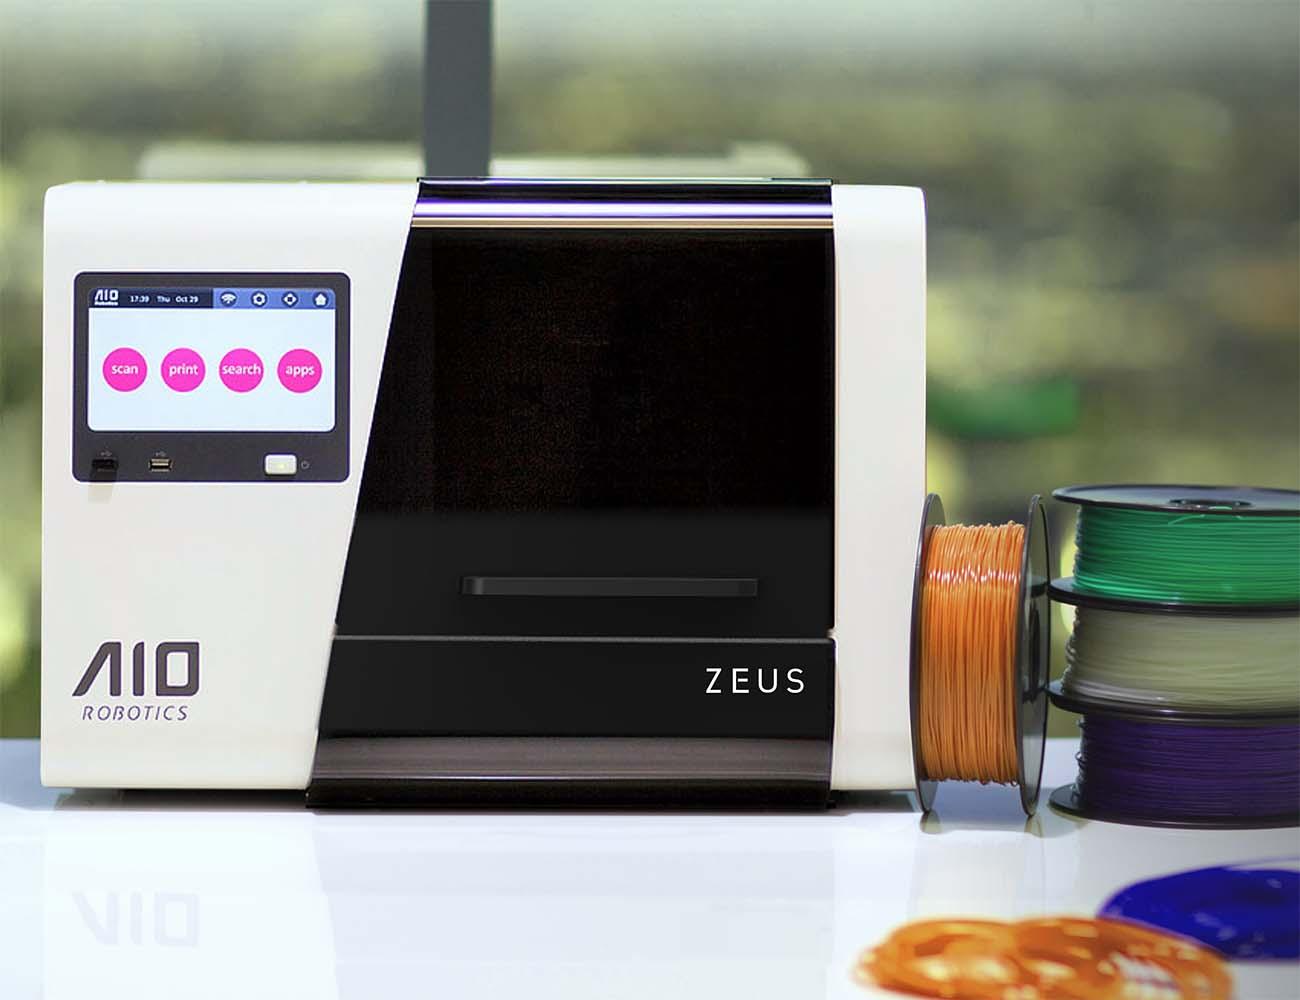 Zeus+All-In-One+3D+Printer+By+AIO+Robotics